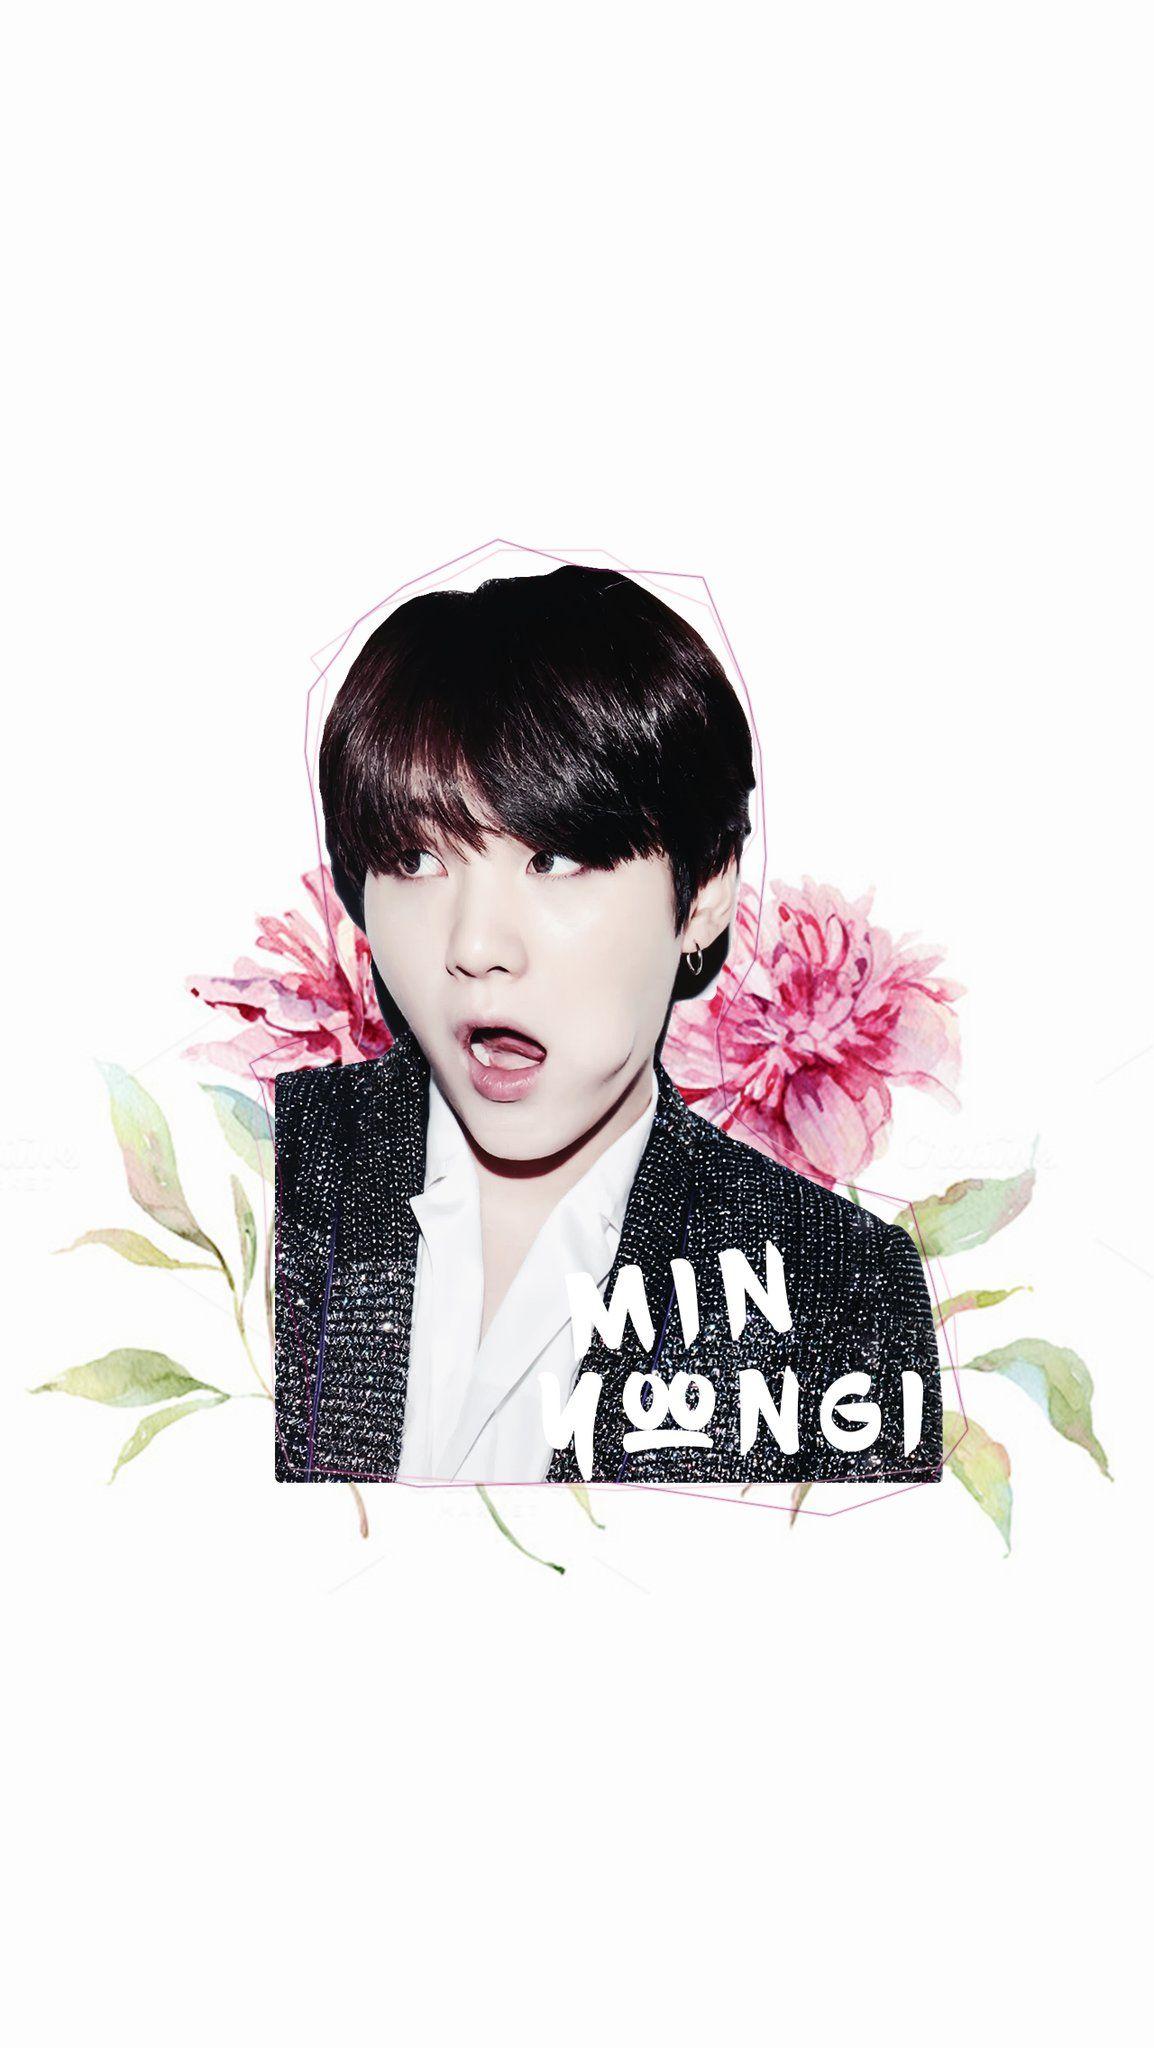 Suga iphone wallpaper tumblr - Bts Yoongi Wallpaper Btslocks_